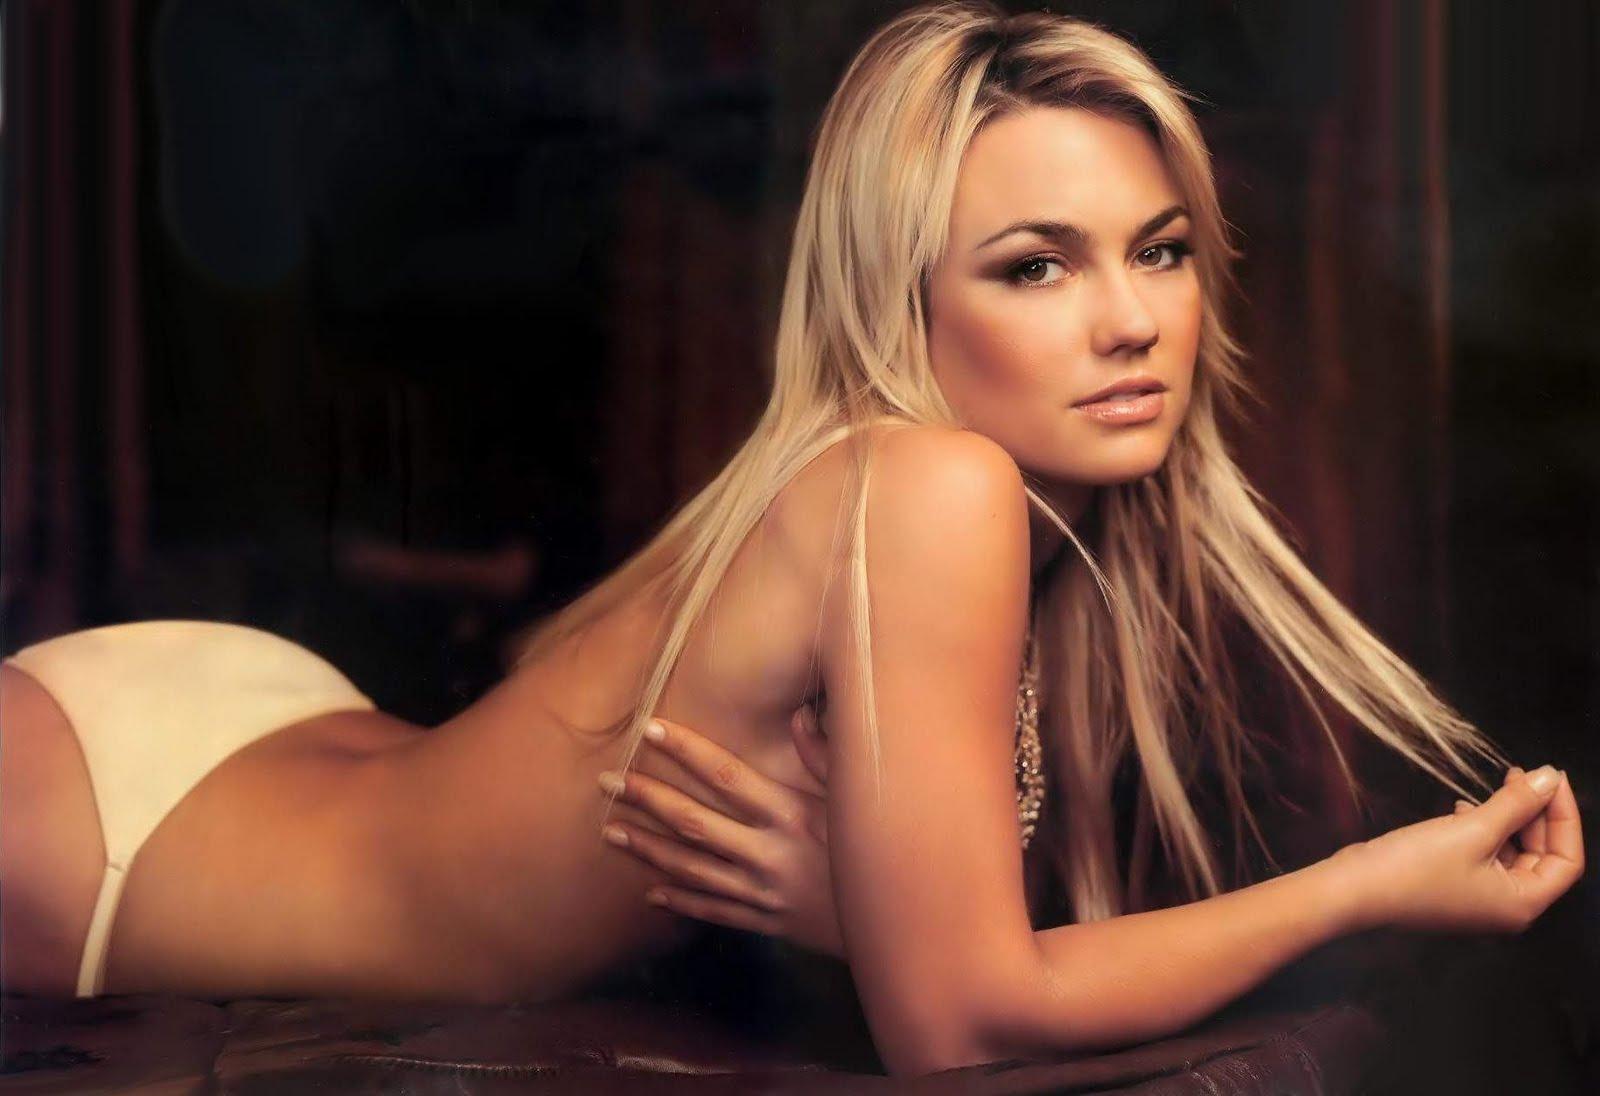 Kelly carlson nude fantastica